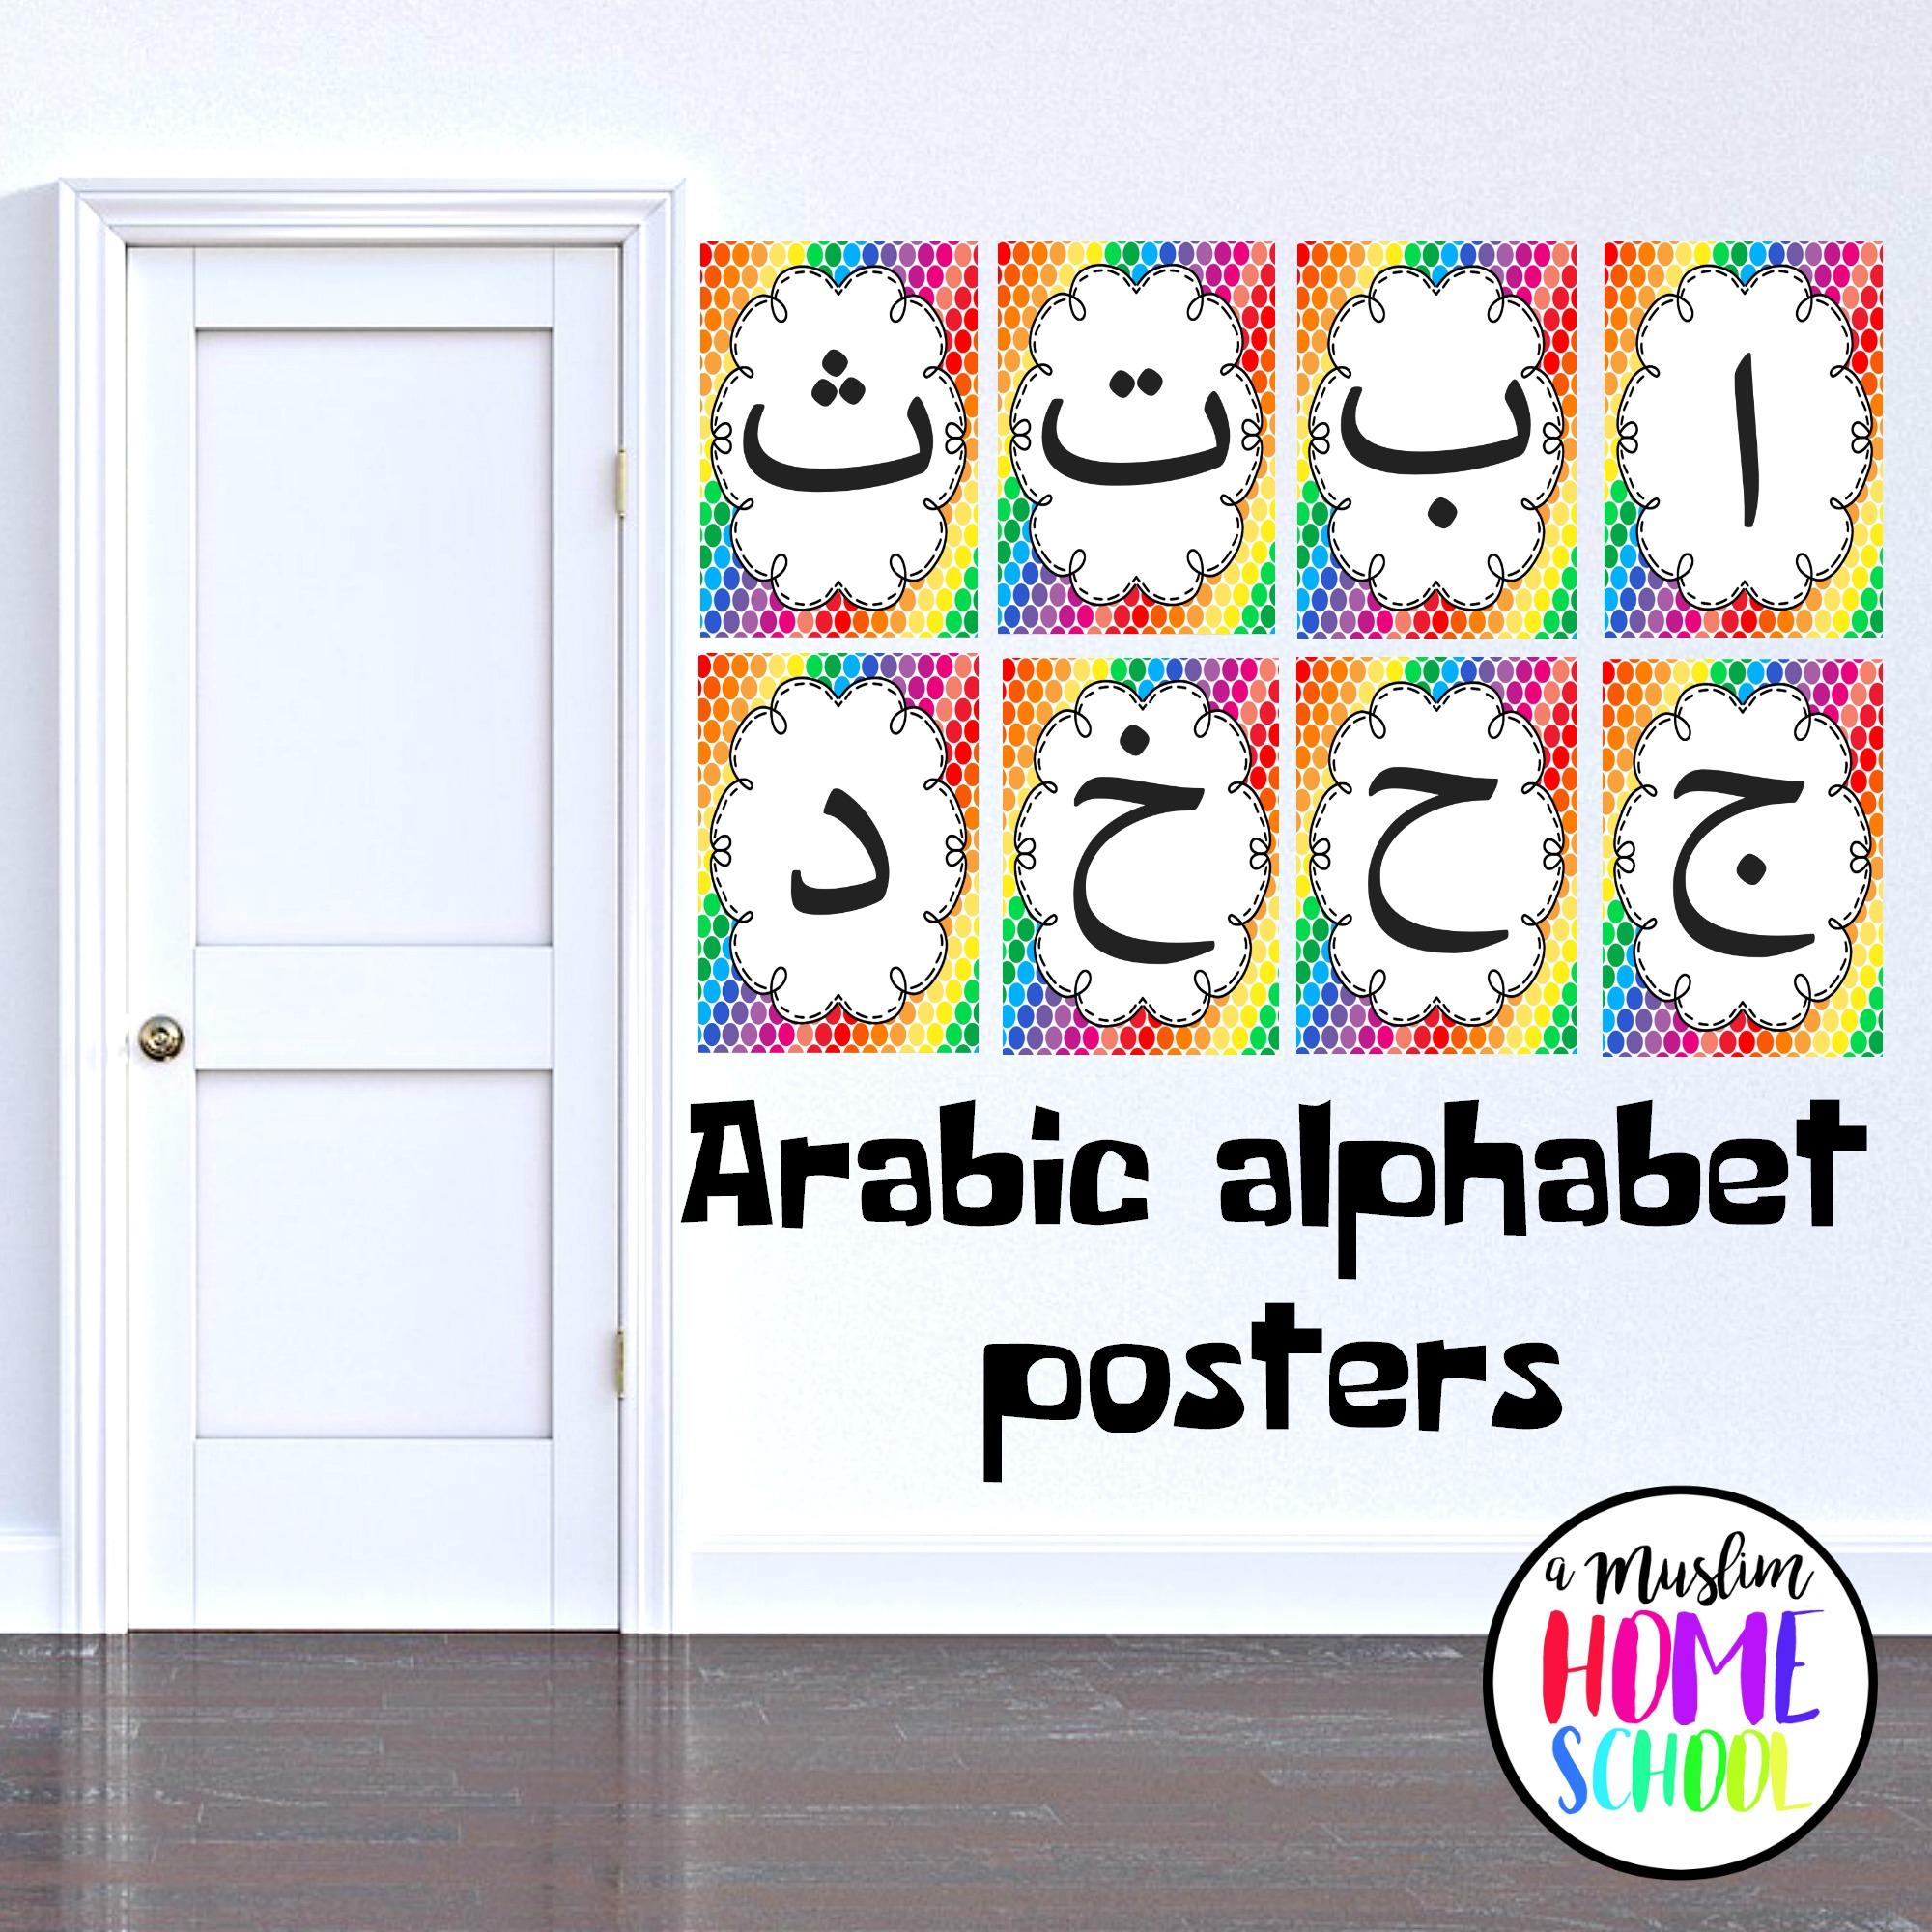 Arabic Alphabet Posters inside Arabic Alphabet Poster Printable